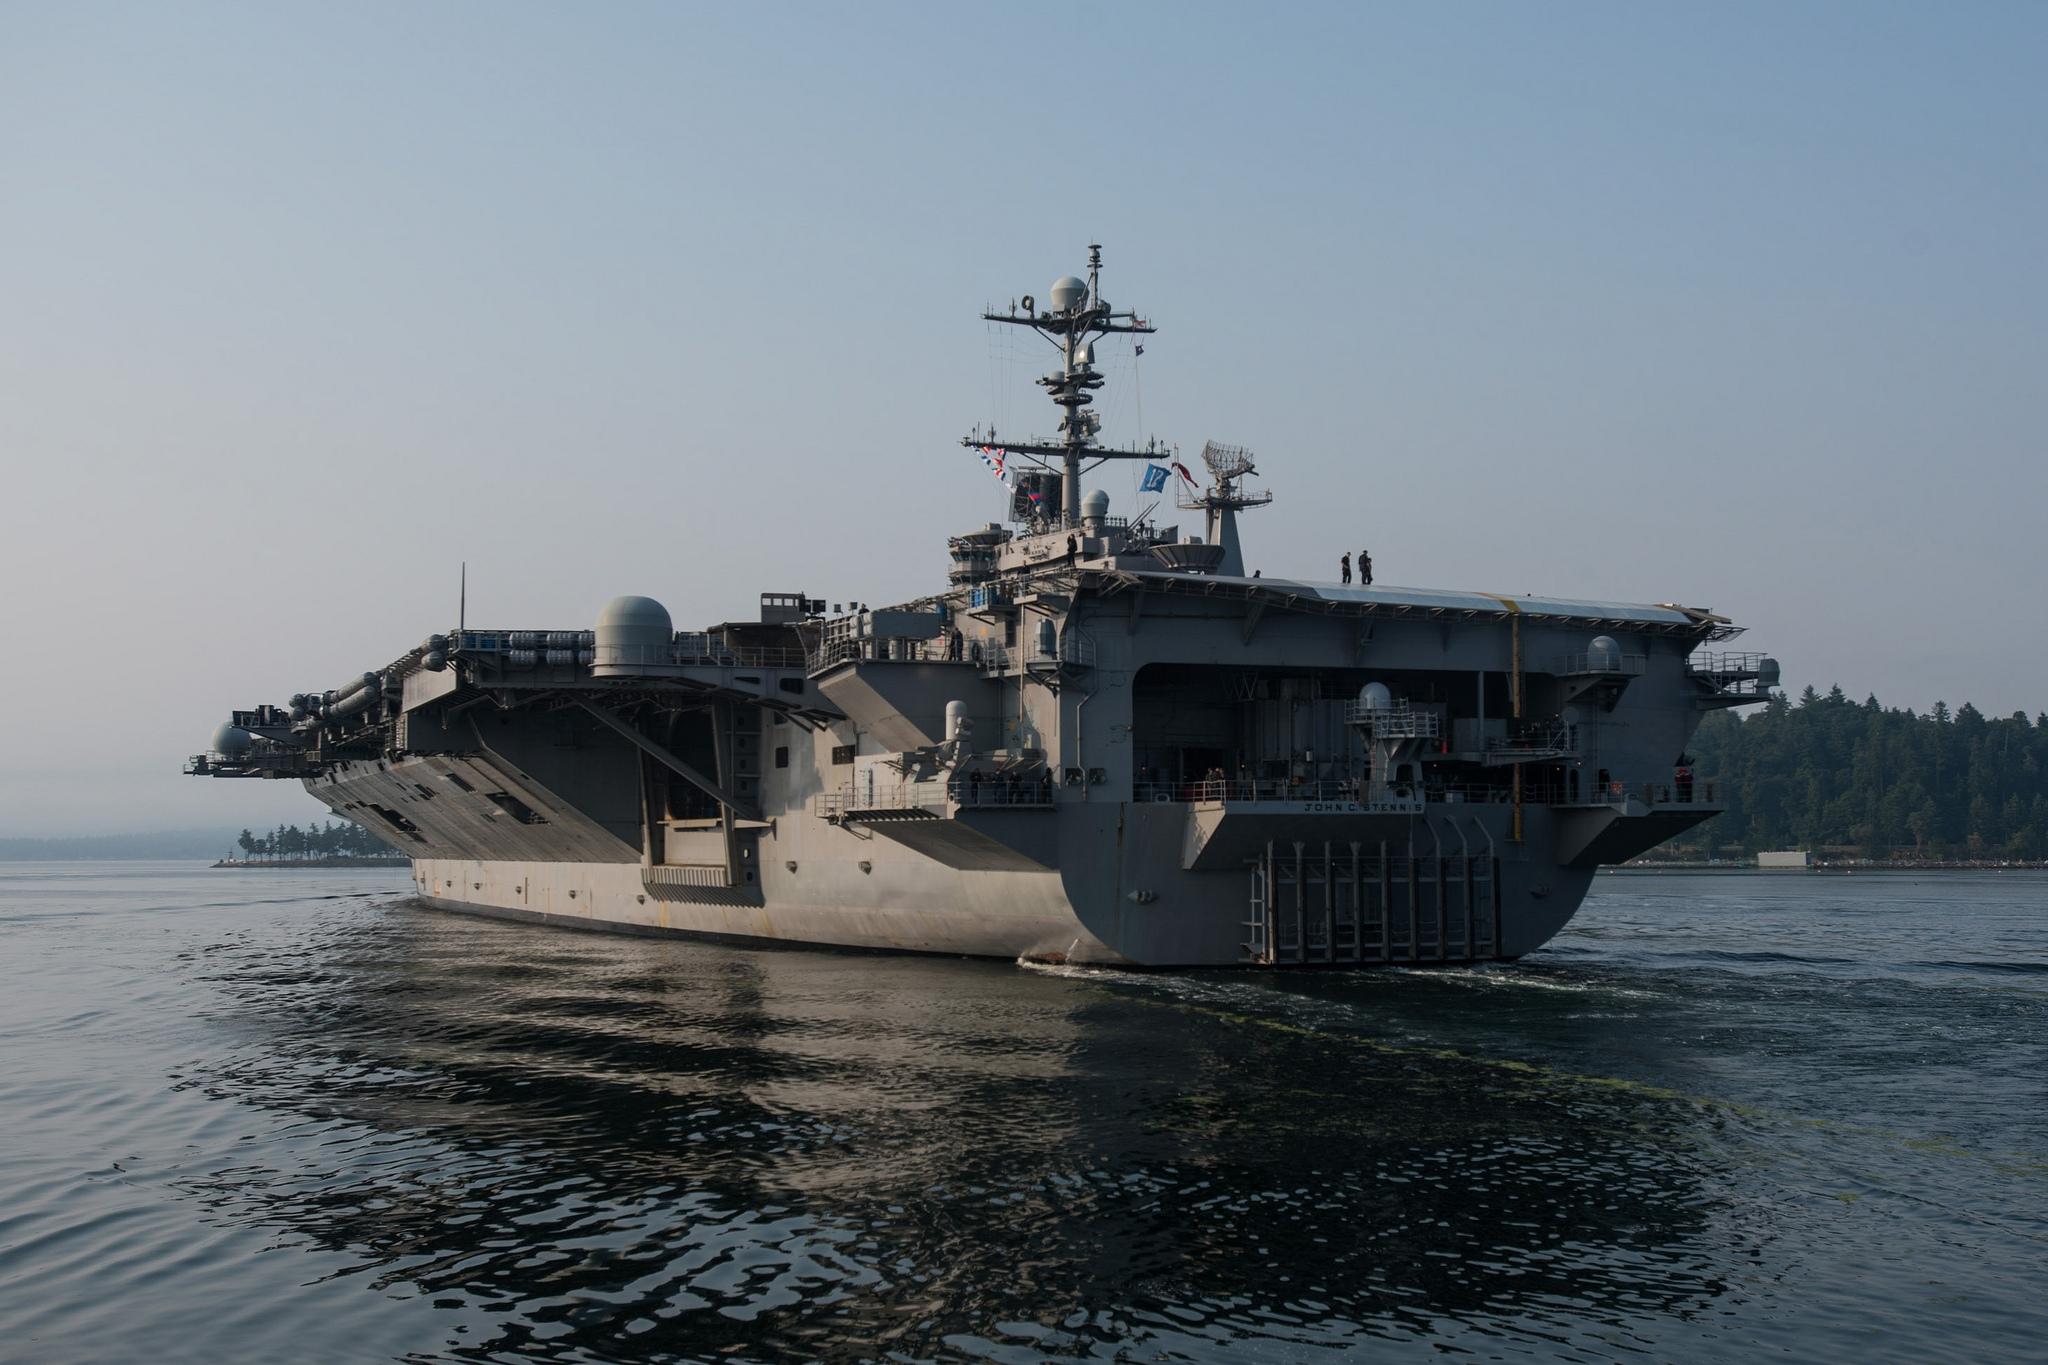 Photo: US Navy/Mass Communication Specialist 3rd Class Dakota Rayburn